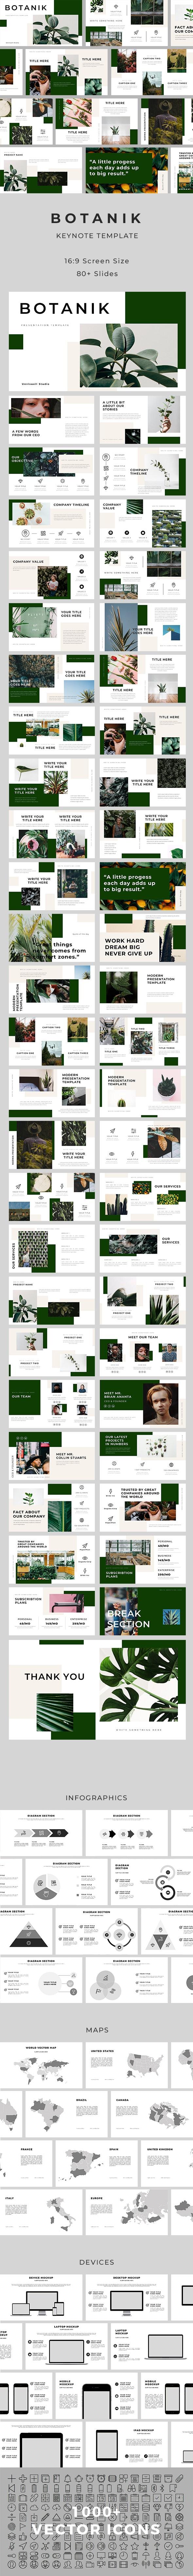 Botanik Keynote Template - Keynote Templates Presentation Templates